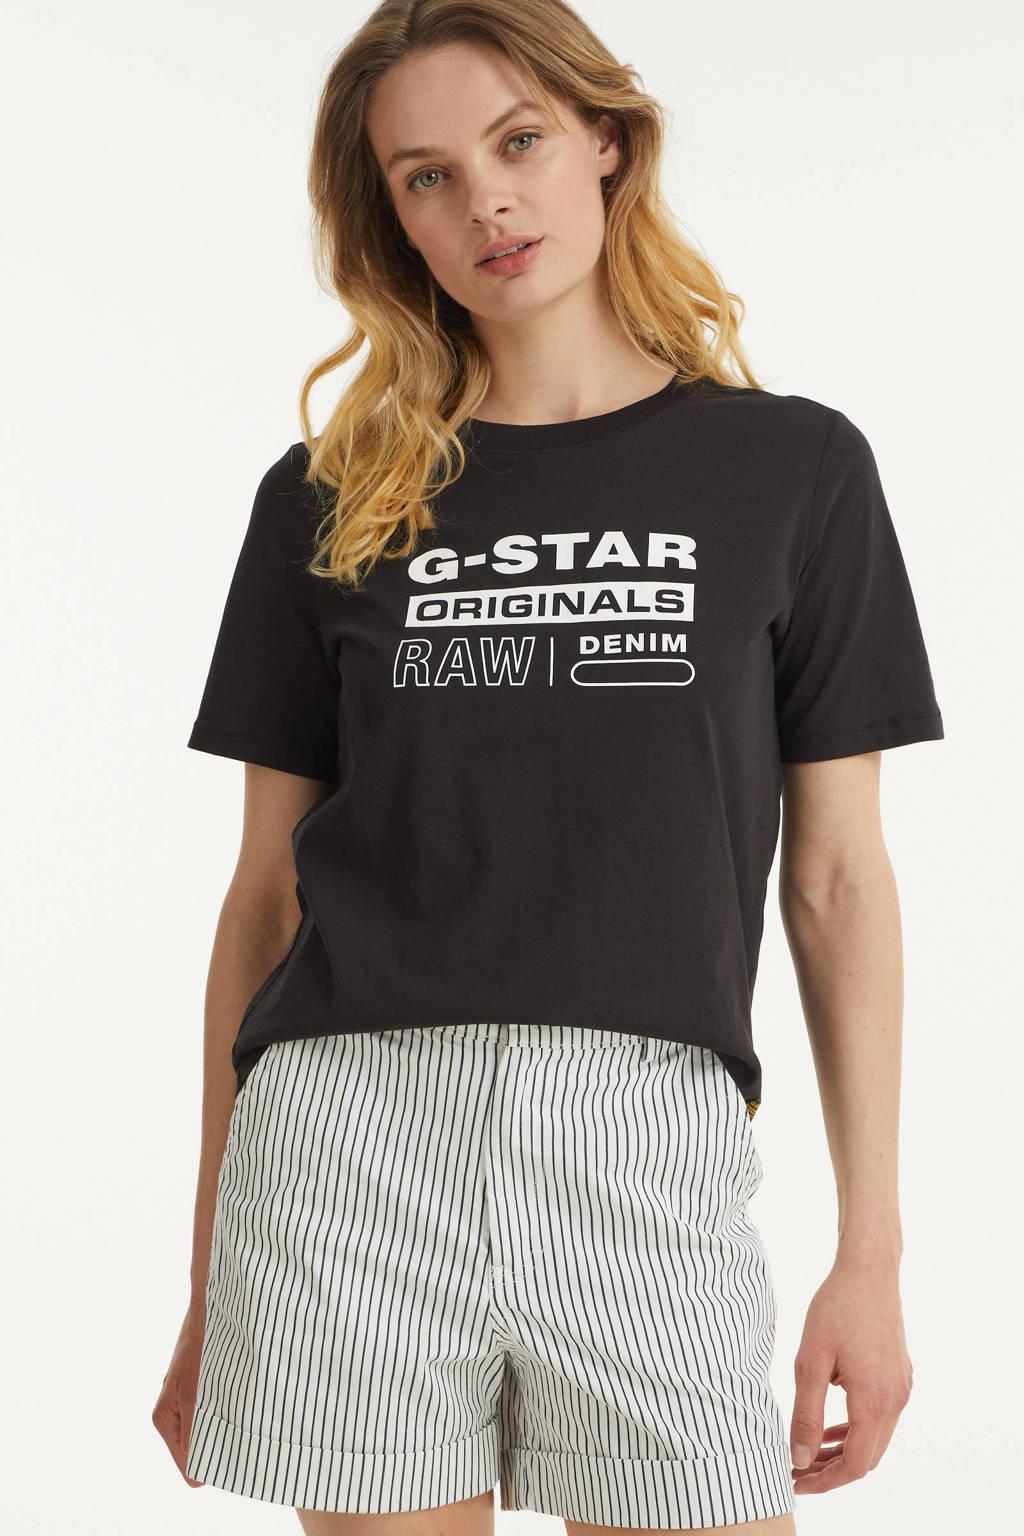 G-Star RAW T-shirt van biologisch katoen wit, Zwart